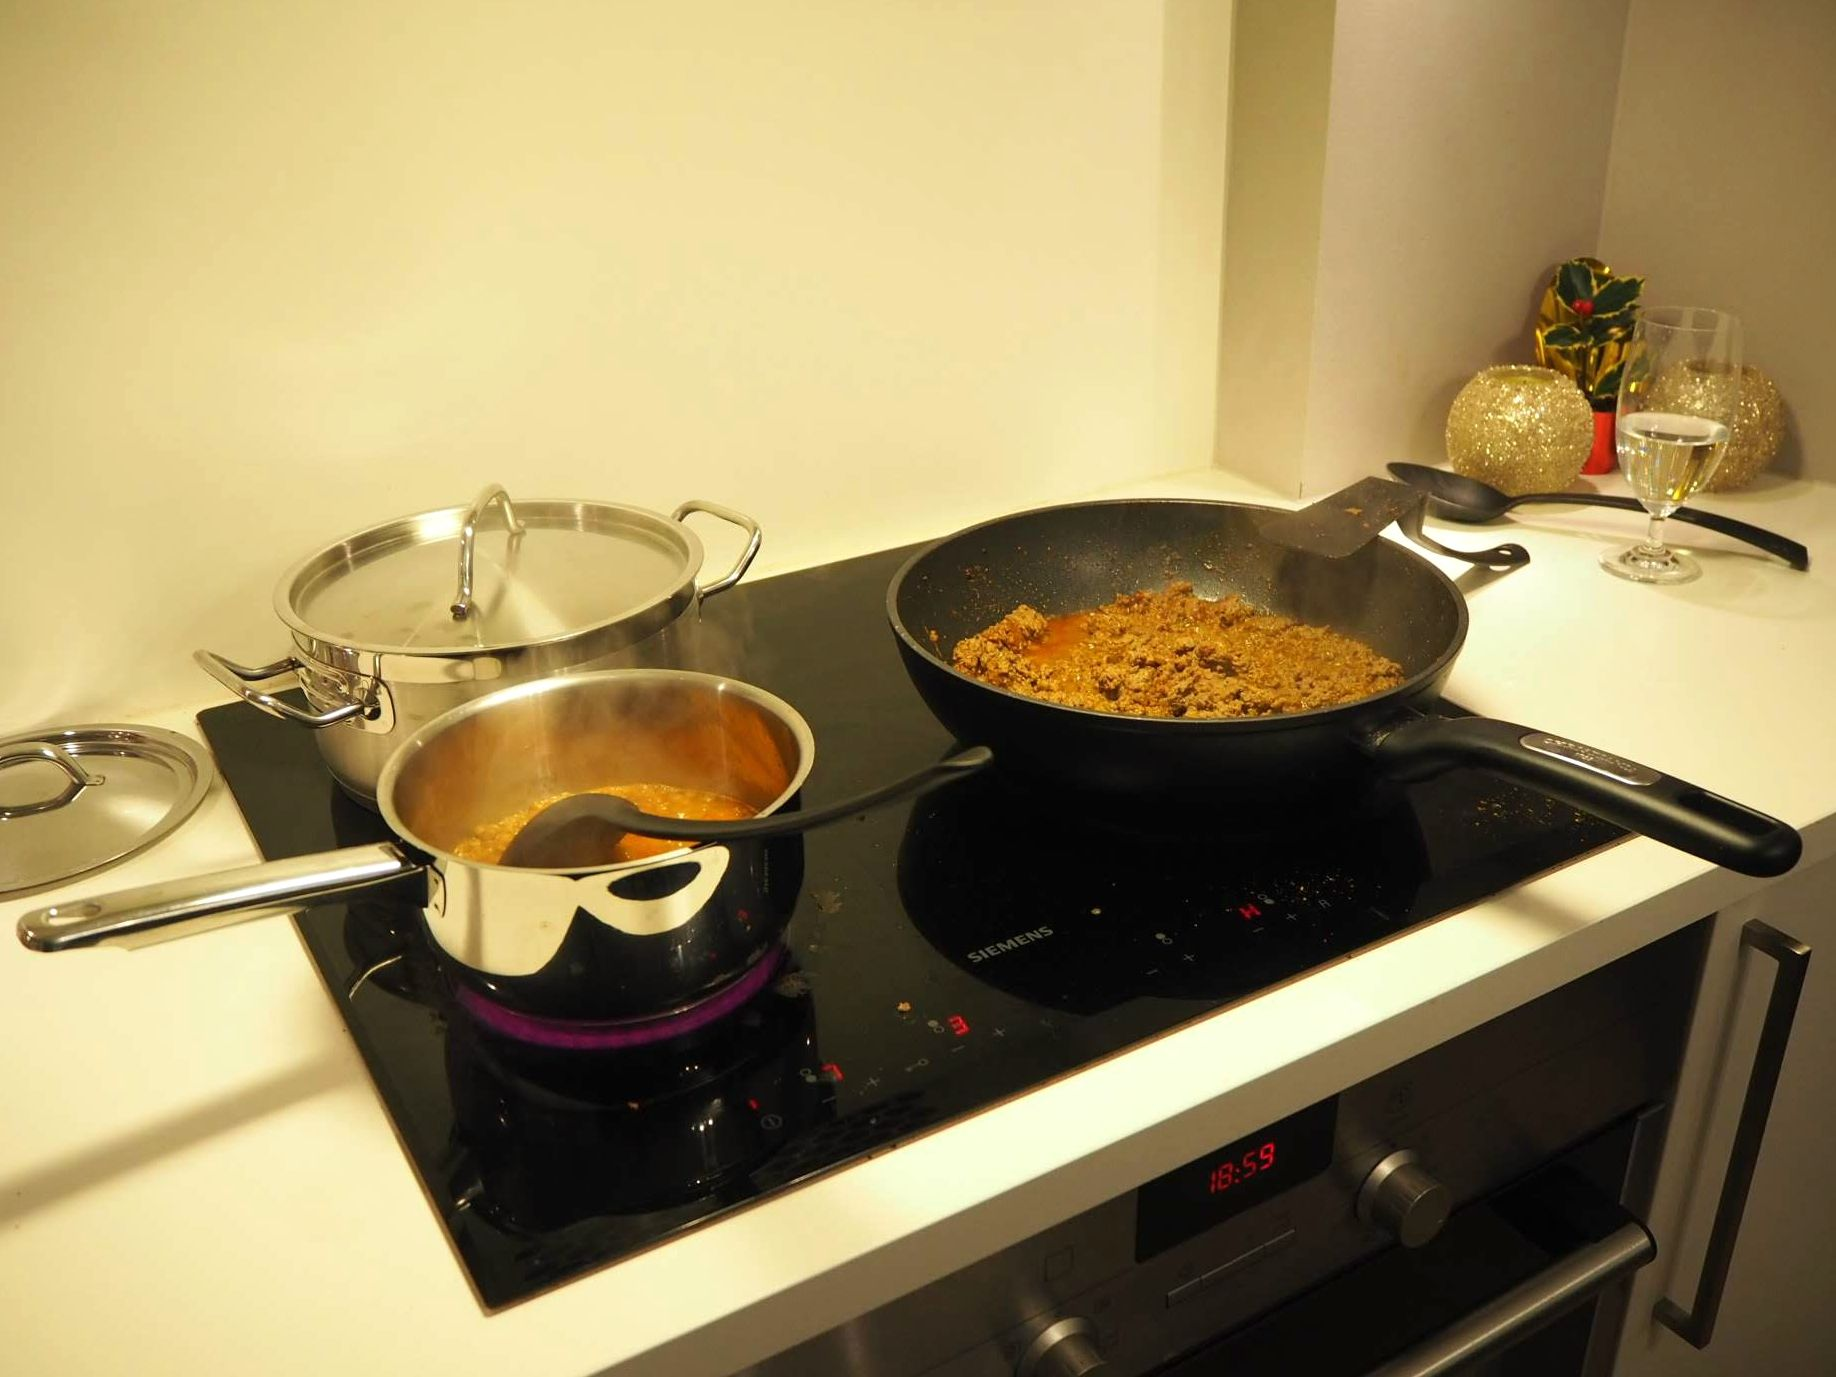 Preparing for Tacosgiving